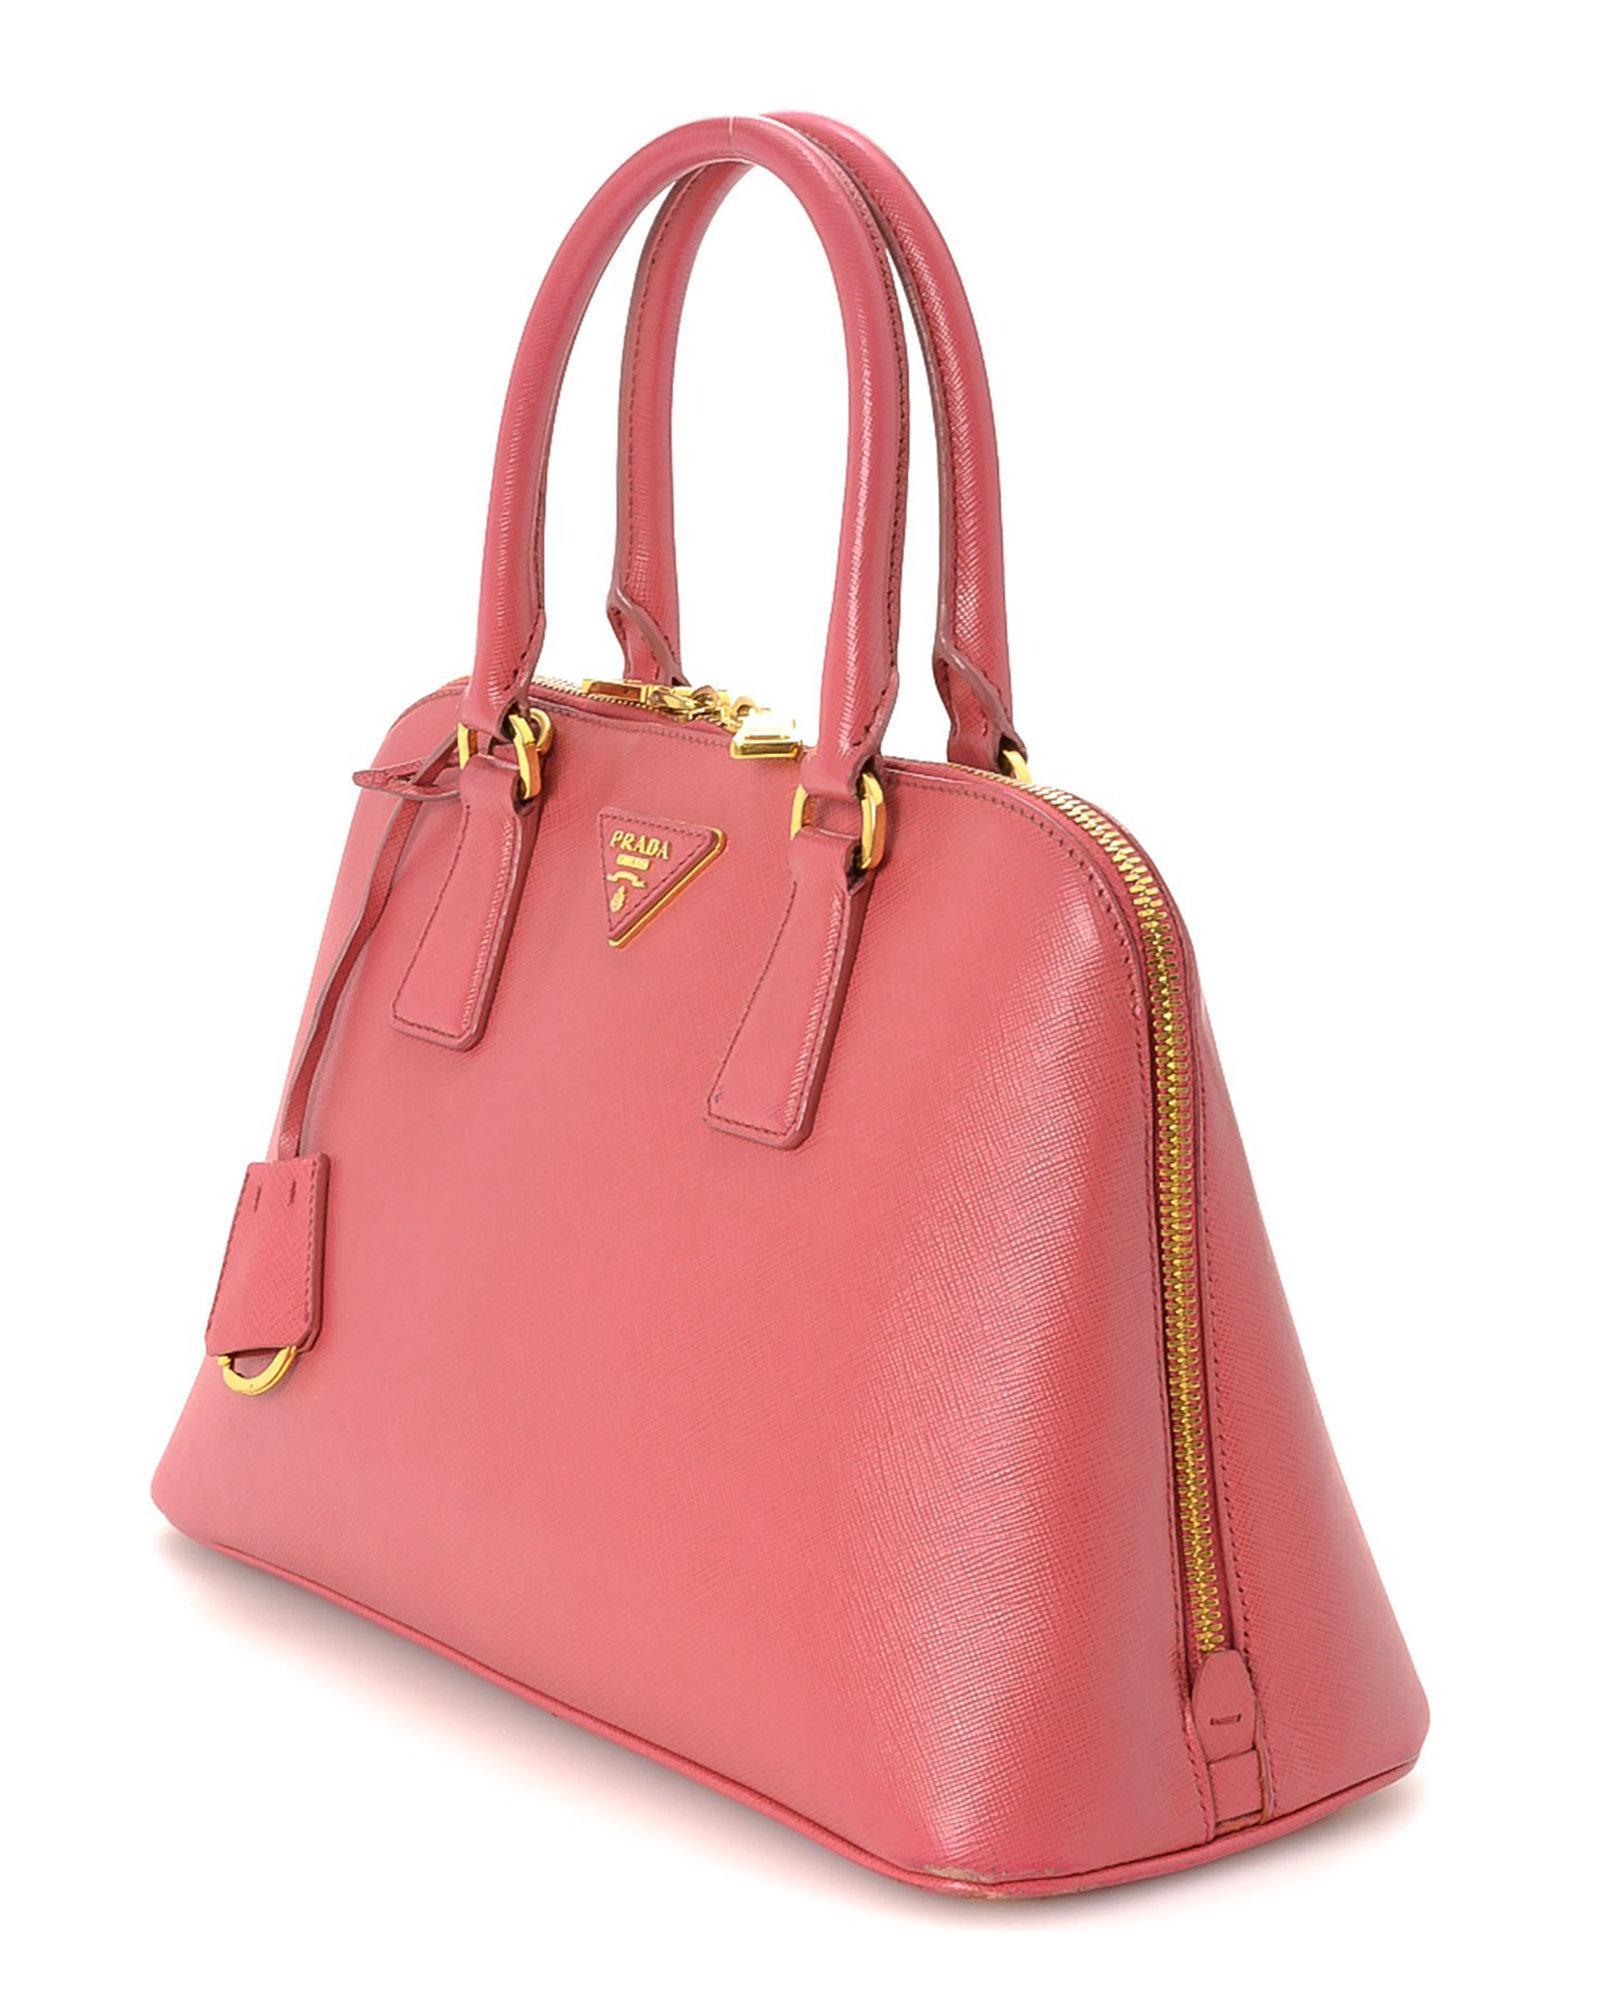 6b474bfa64f2 Prada Saffiano Two Way Handbag - Vintage in Pink - Lyst